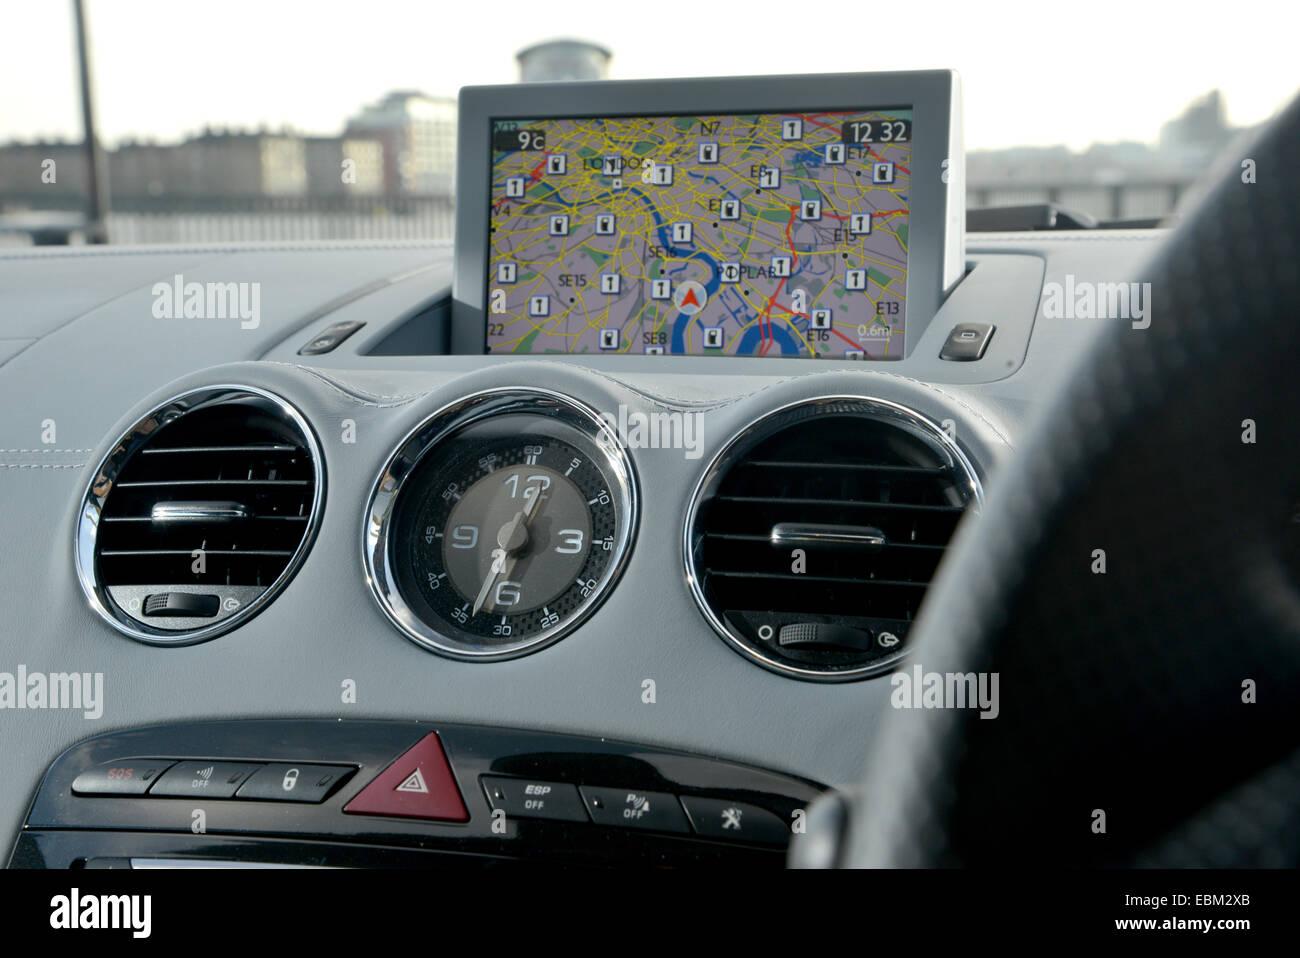 2013 Peugeot RCZ coupe sports car - Stock Image